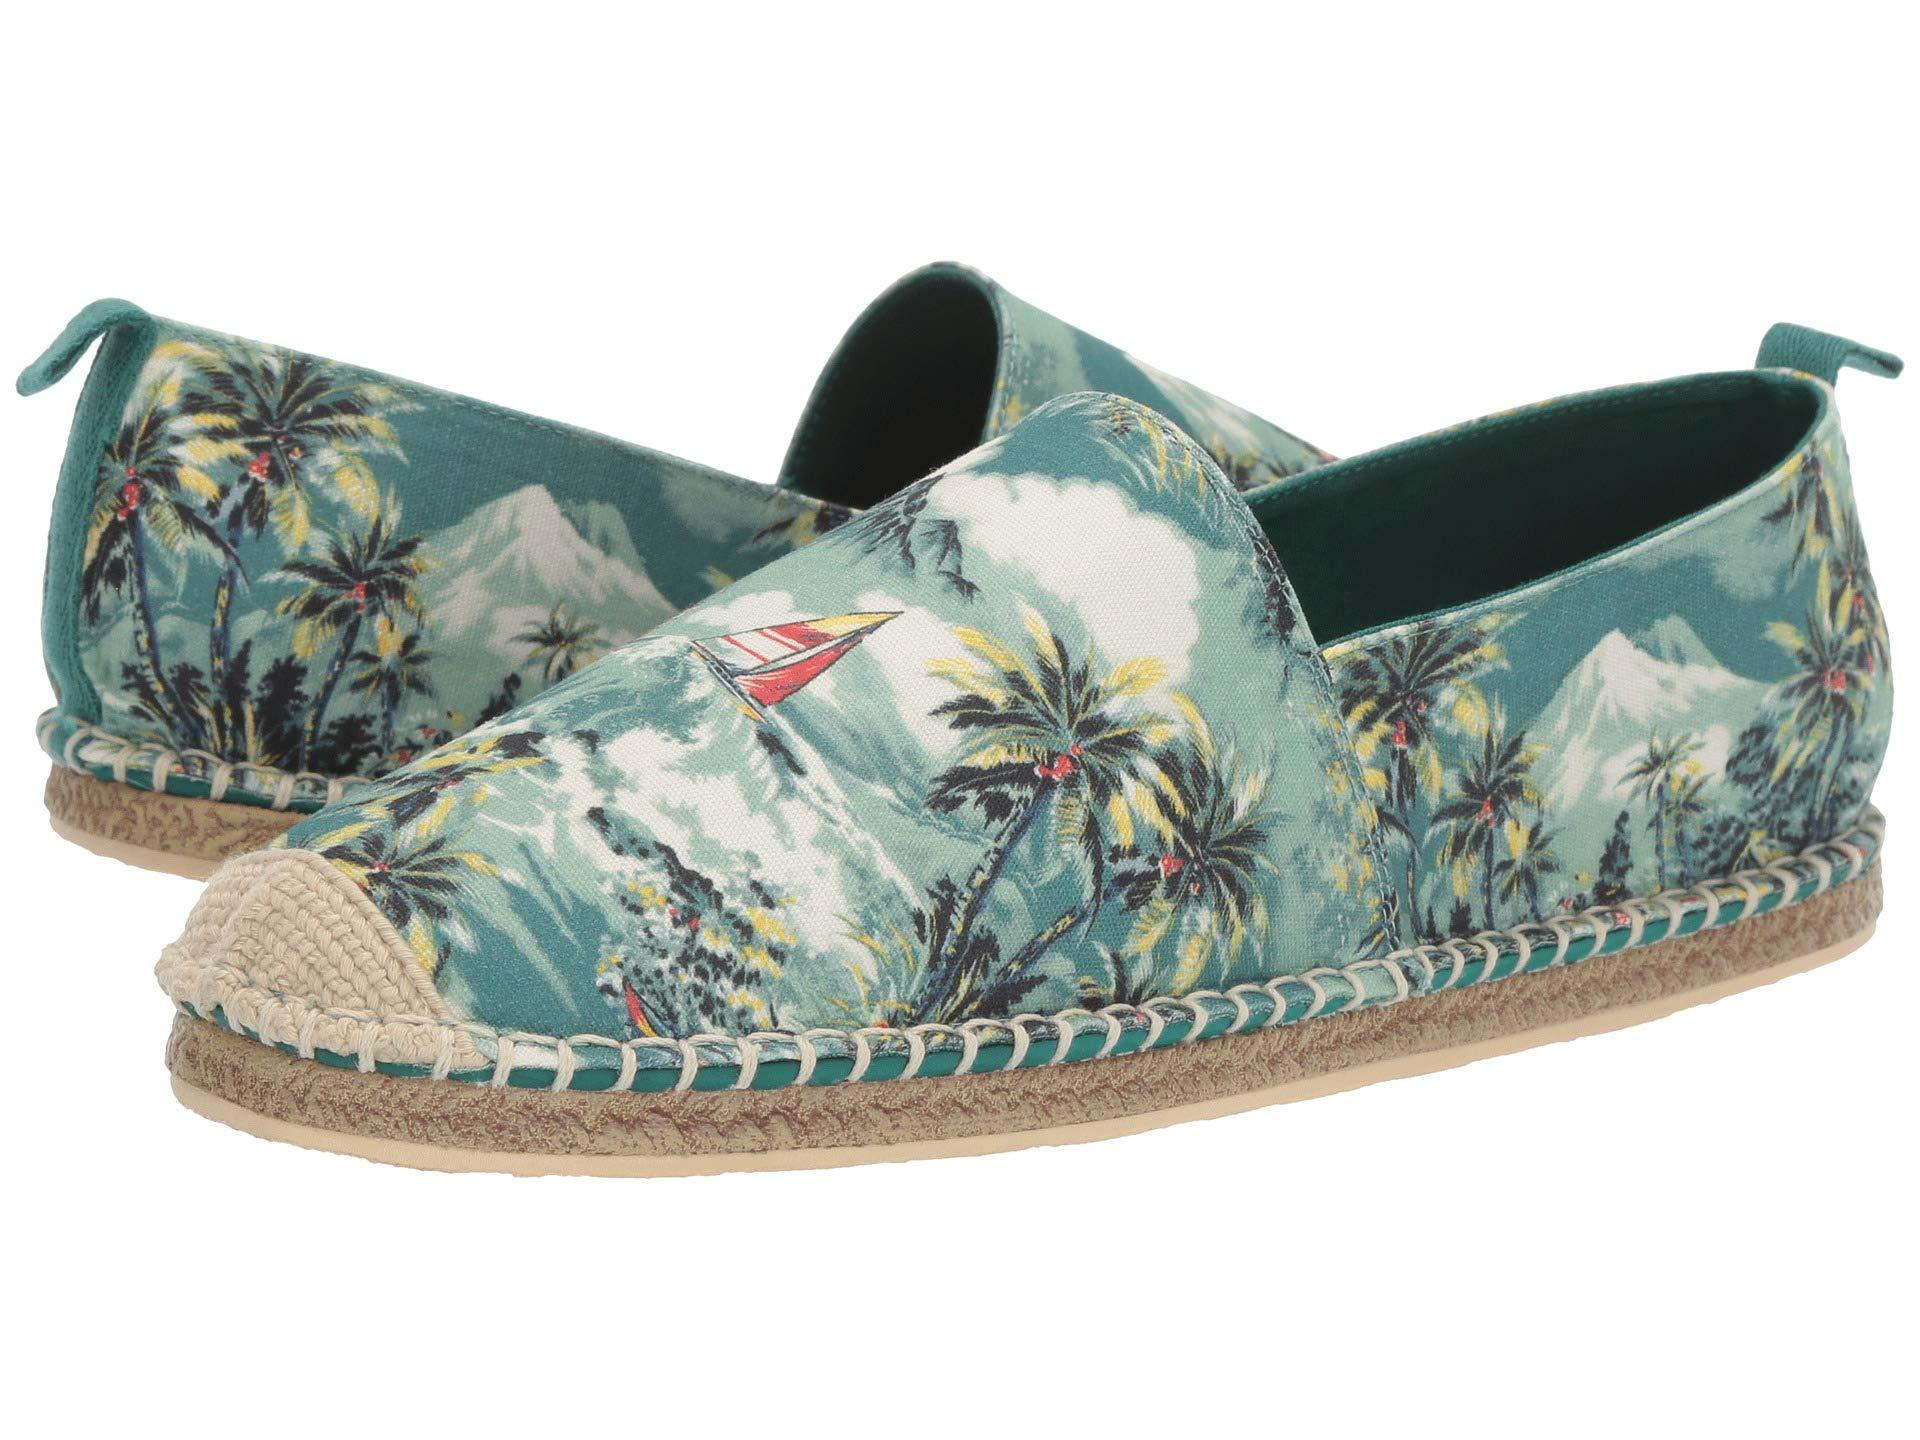 New Mens Polo Ralph Lauren Green Multi Barron Textile Shoes Canvas Slip On